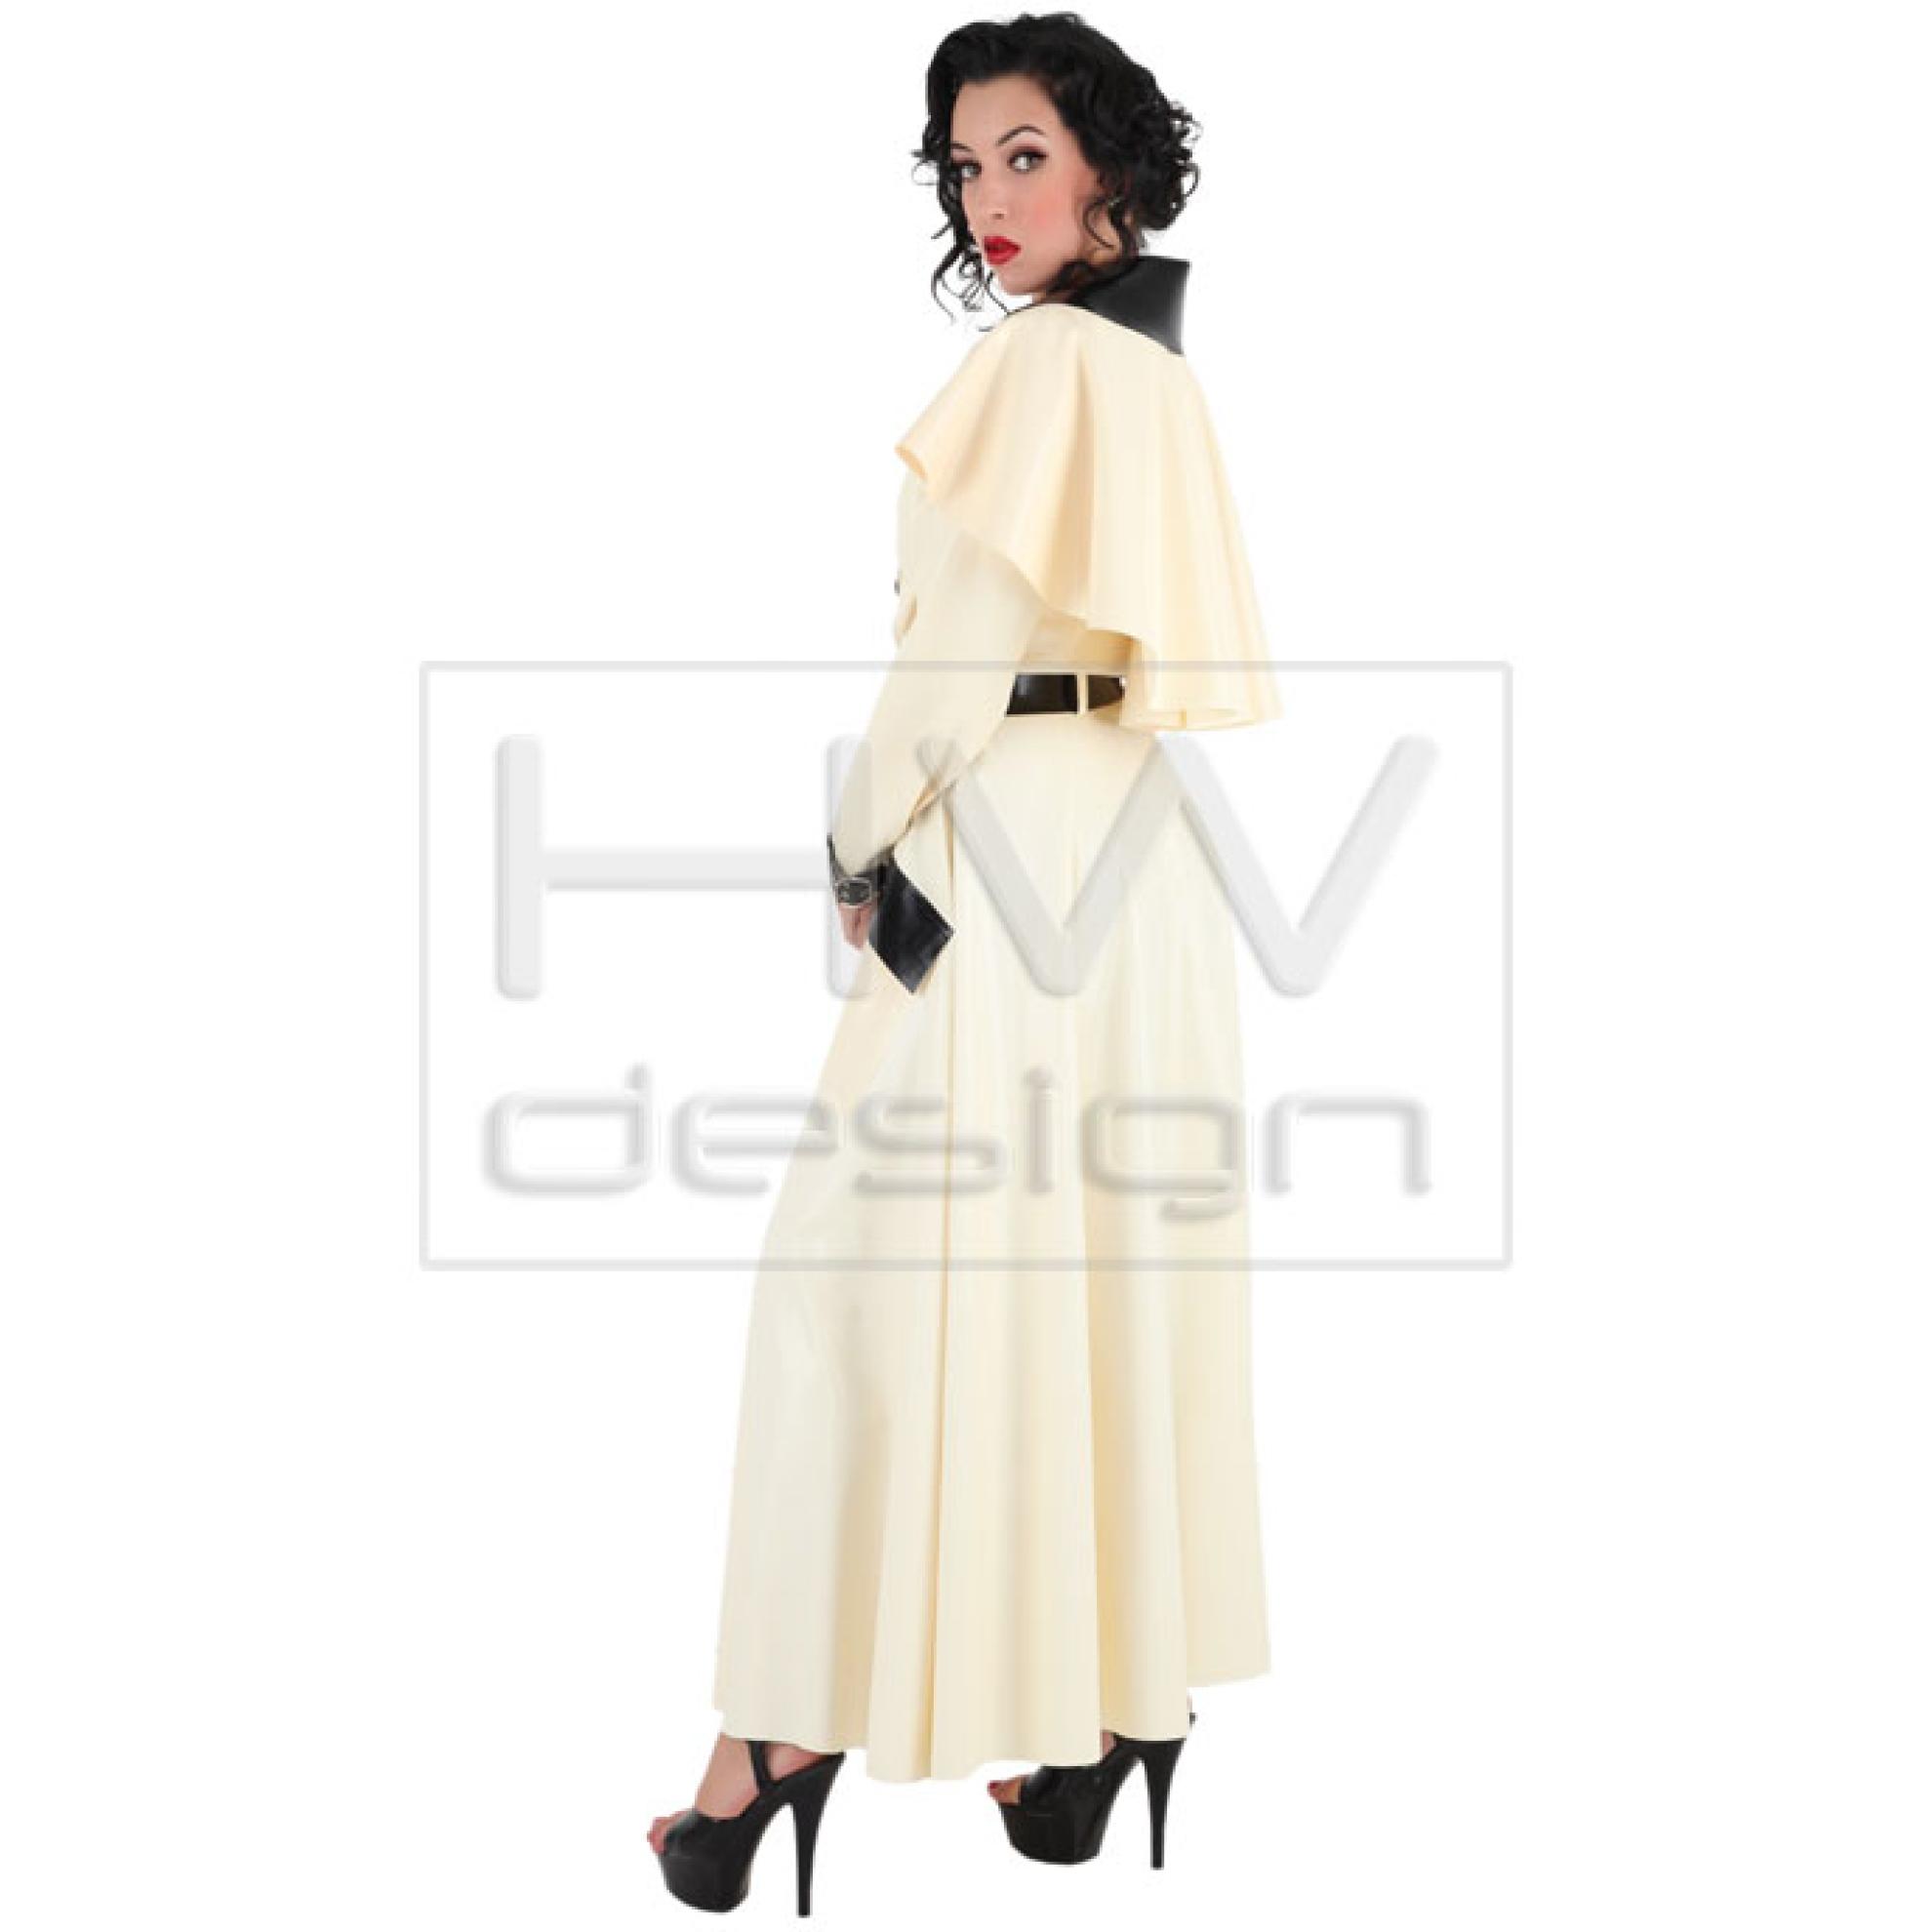 Mantel 10 regenmantel hw fashion latex rubber heavy for Design produkte shop